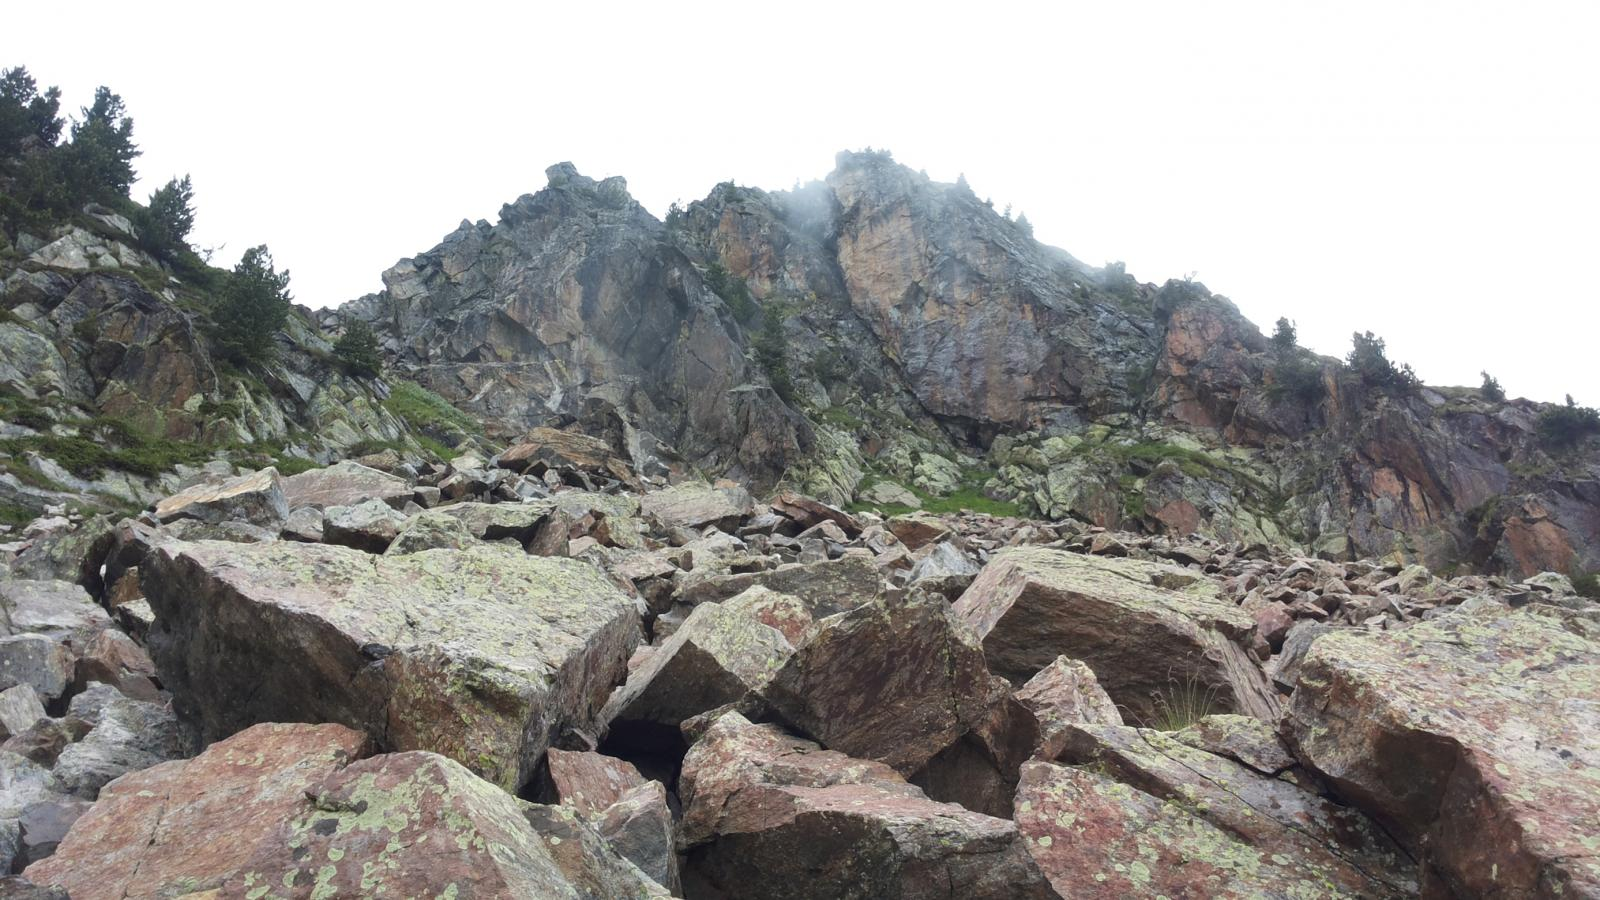 le pietraie sotto il Monte Taf